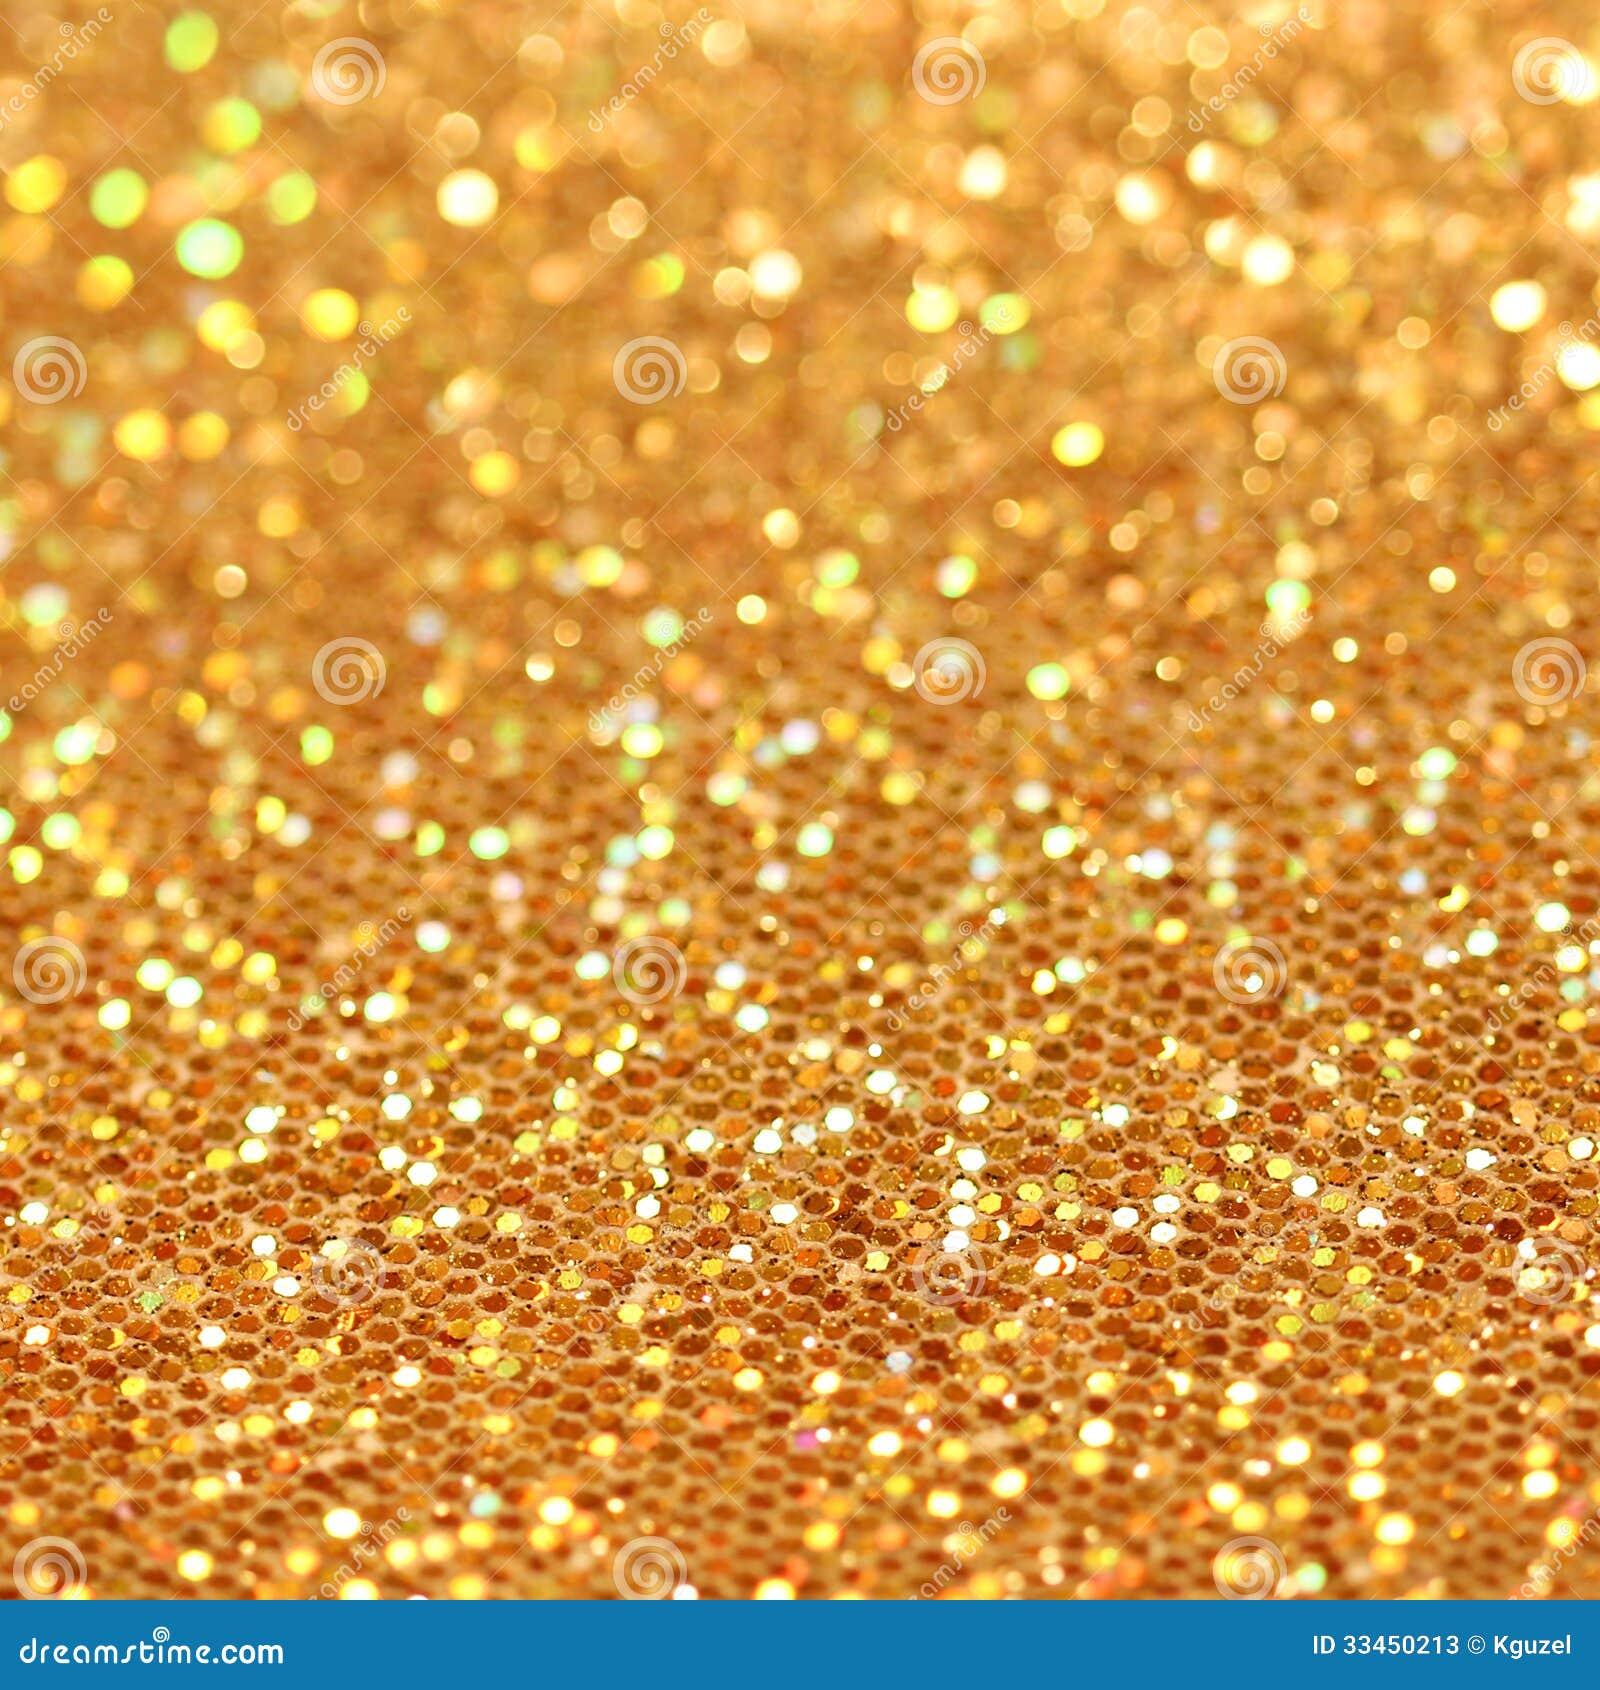 Bokeh. Christmas Gold Blinking Background Stock Photos - Image ...